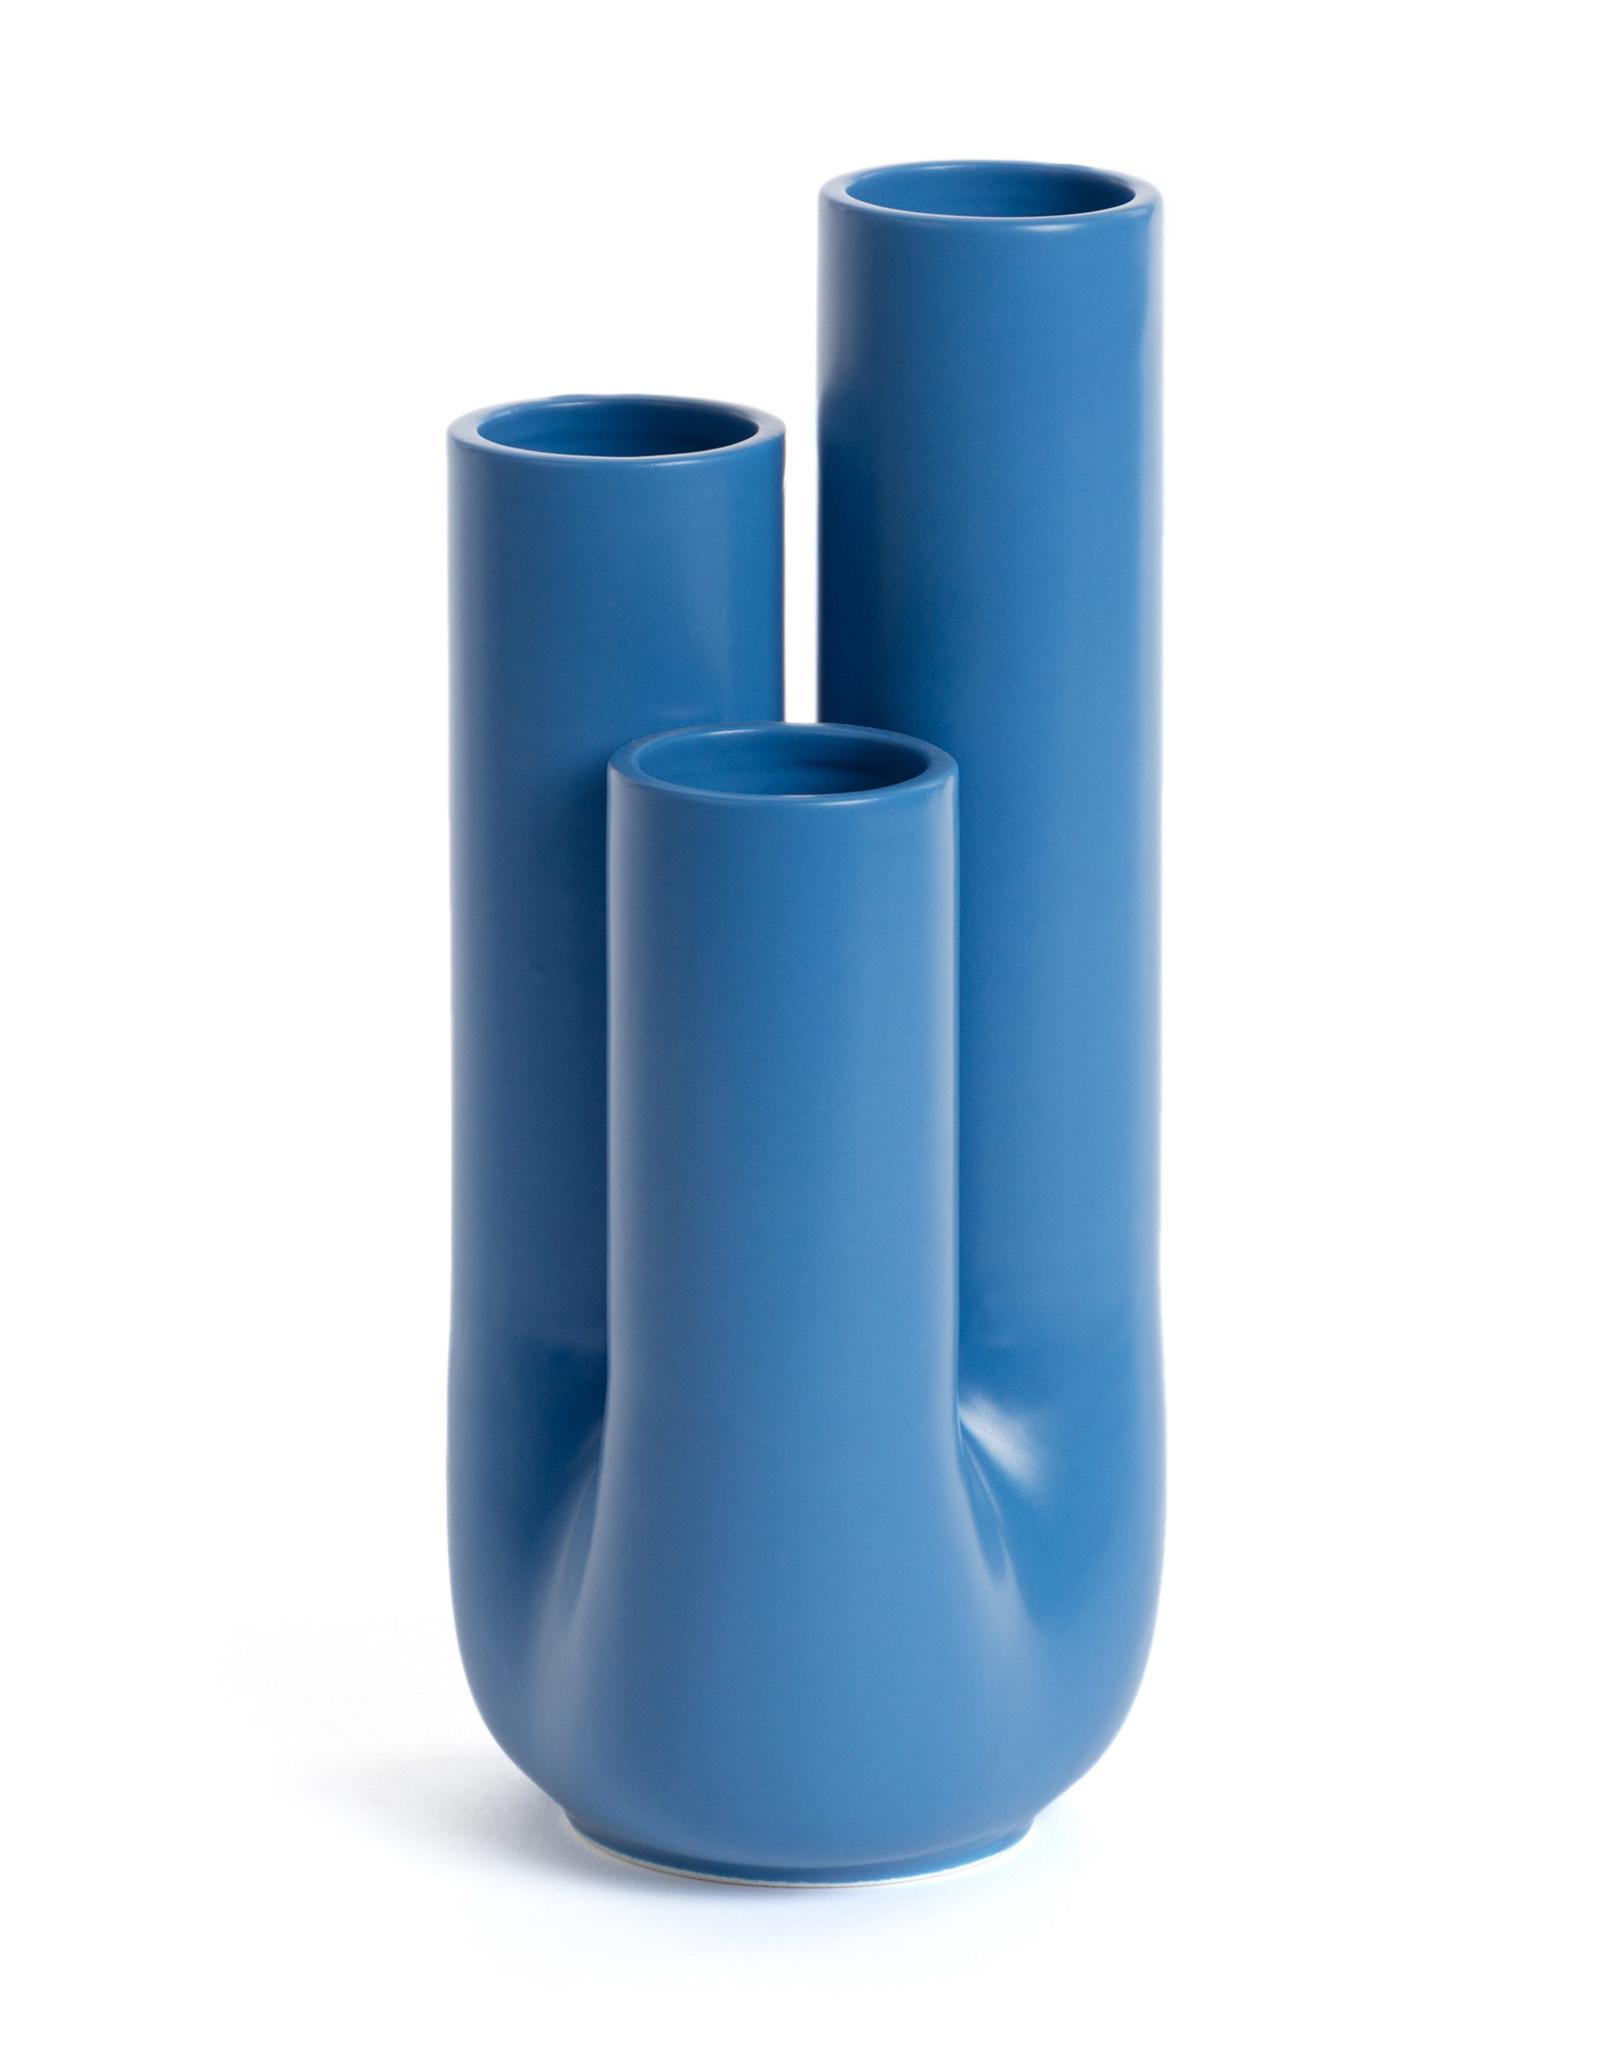 Vaas Tube - sky blue